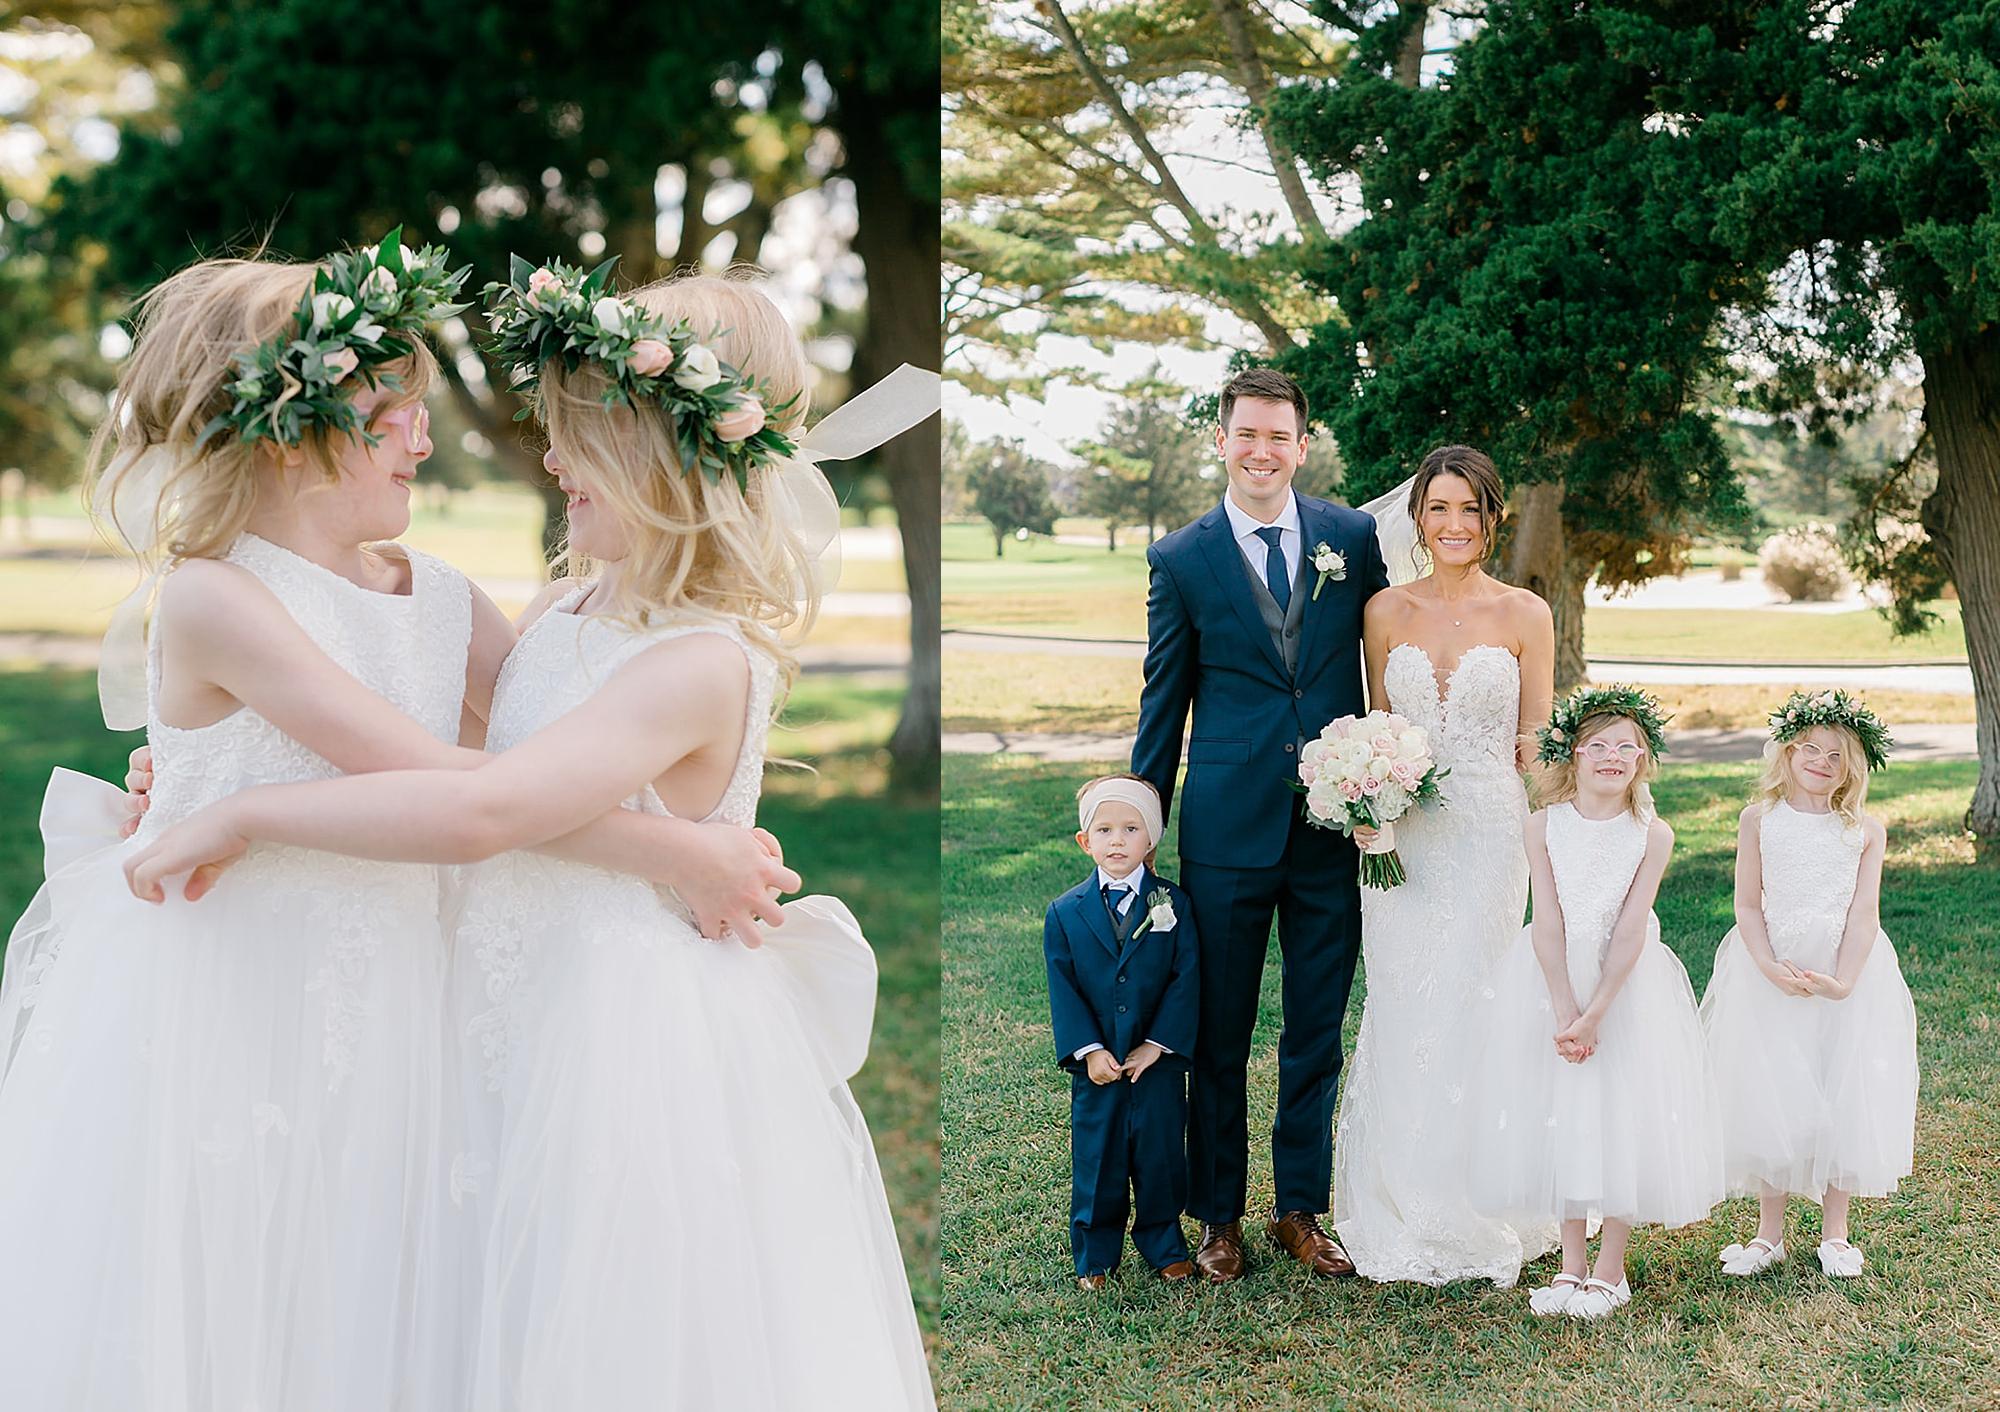 Linwood Country Club Wedding Photography by Magdalena Studios KatieTom0033